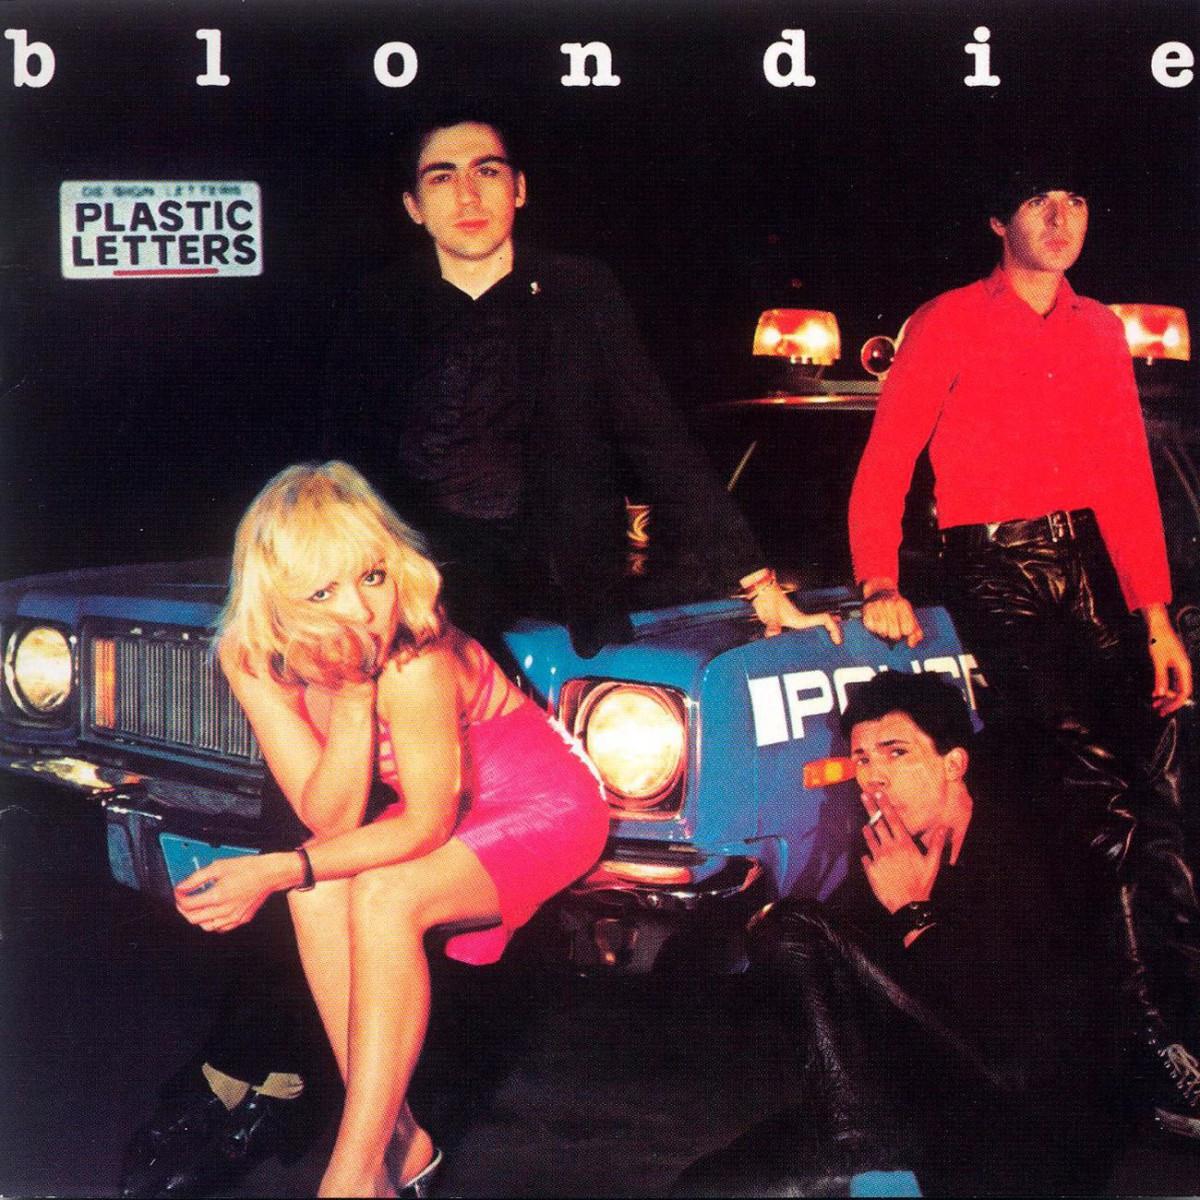 Blondie, Plastic Letters